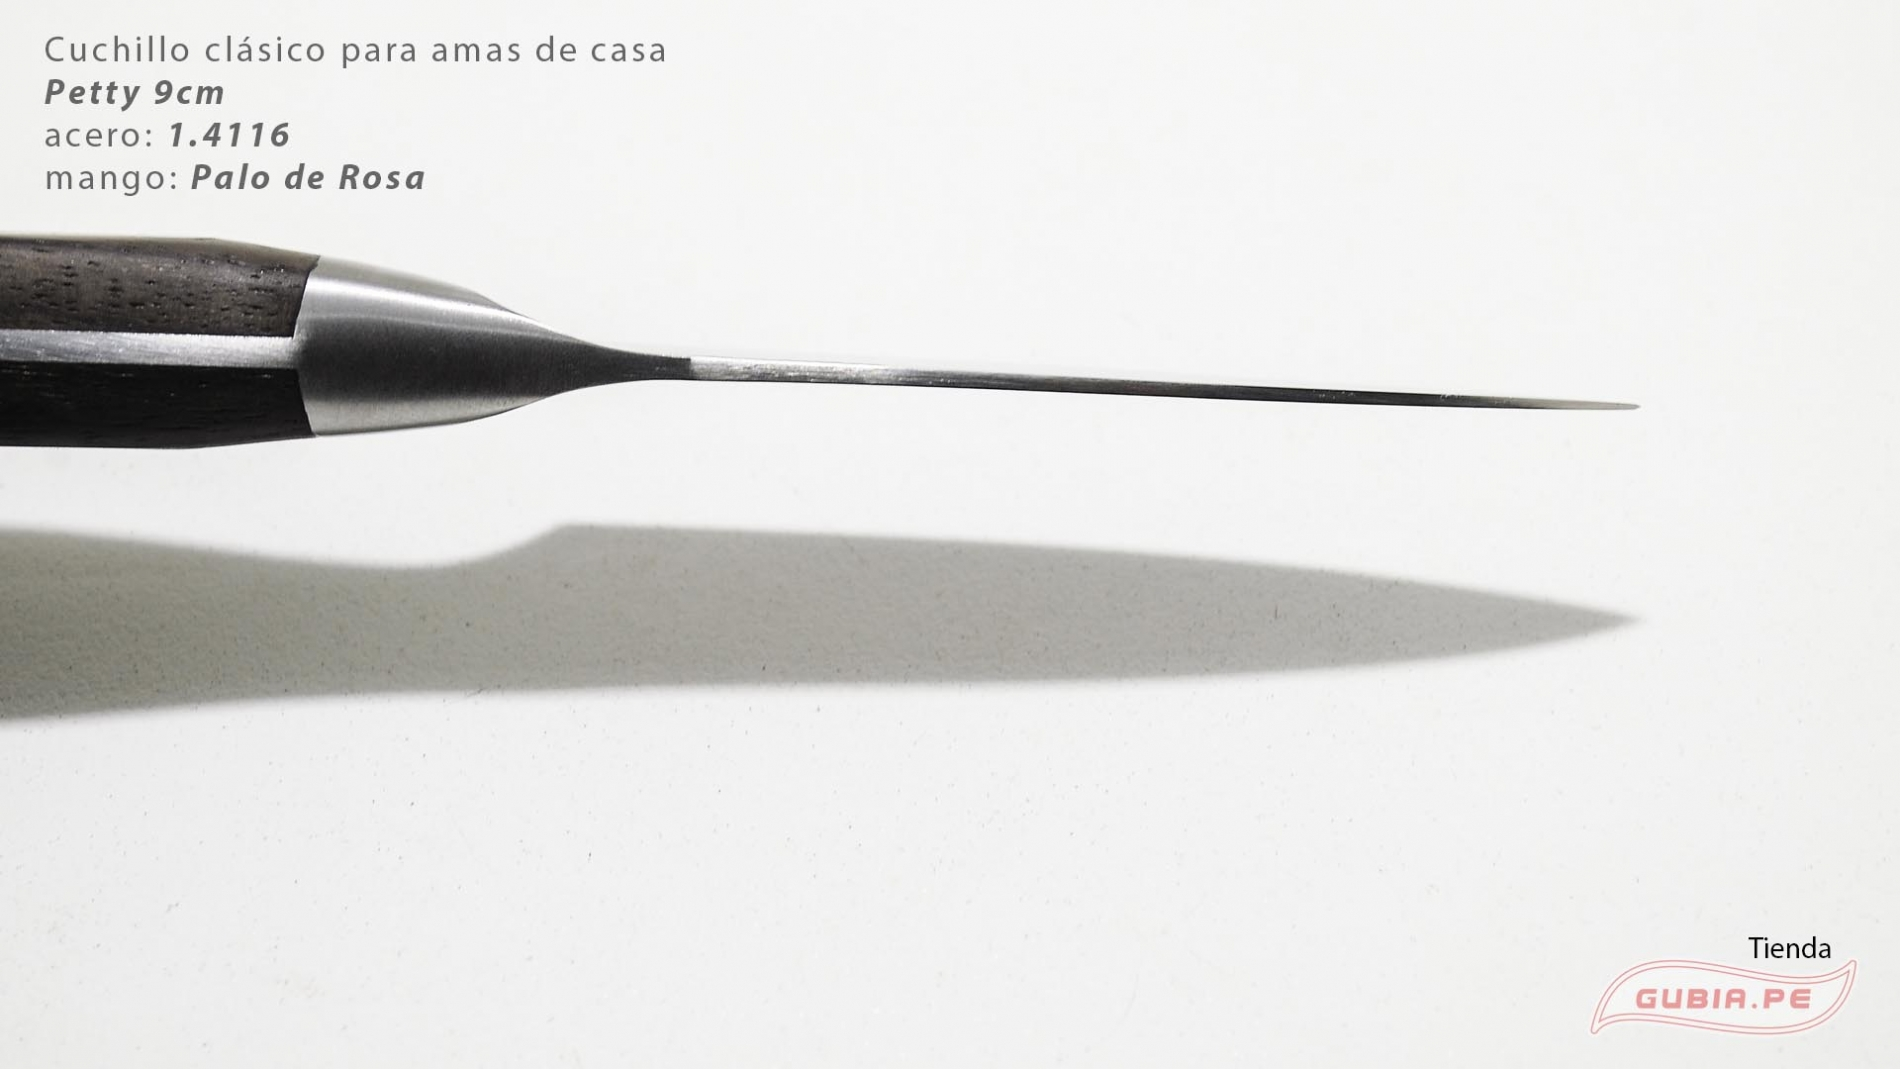 C1p9-Cuchillo Petty 9cm acero 1.4116 Palo de Rosa Clásico C1p9-max-4.